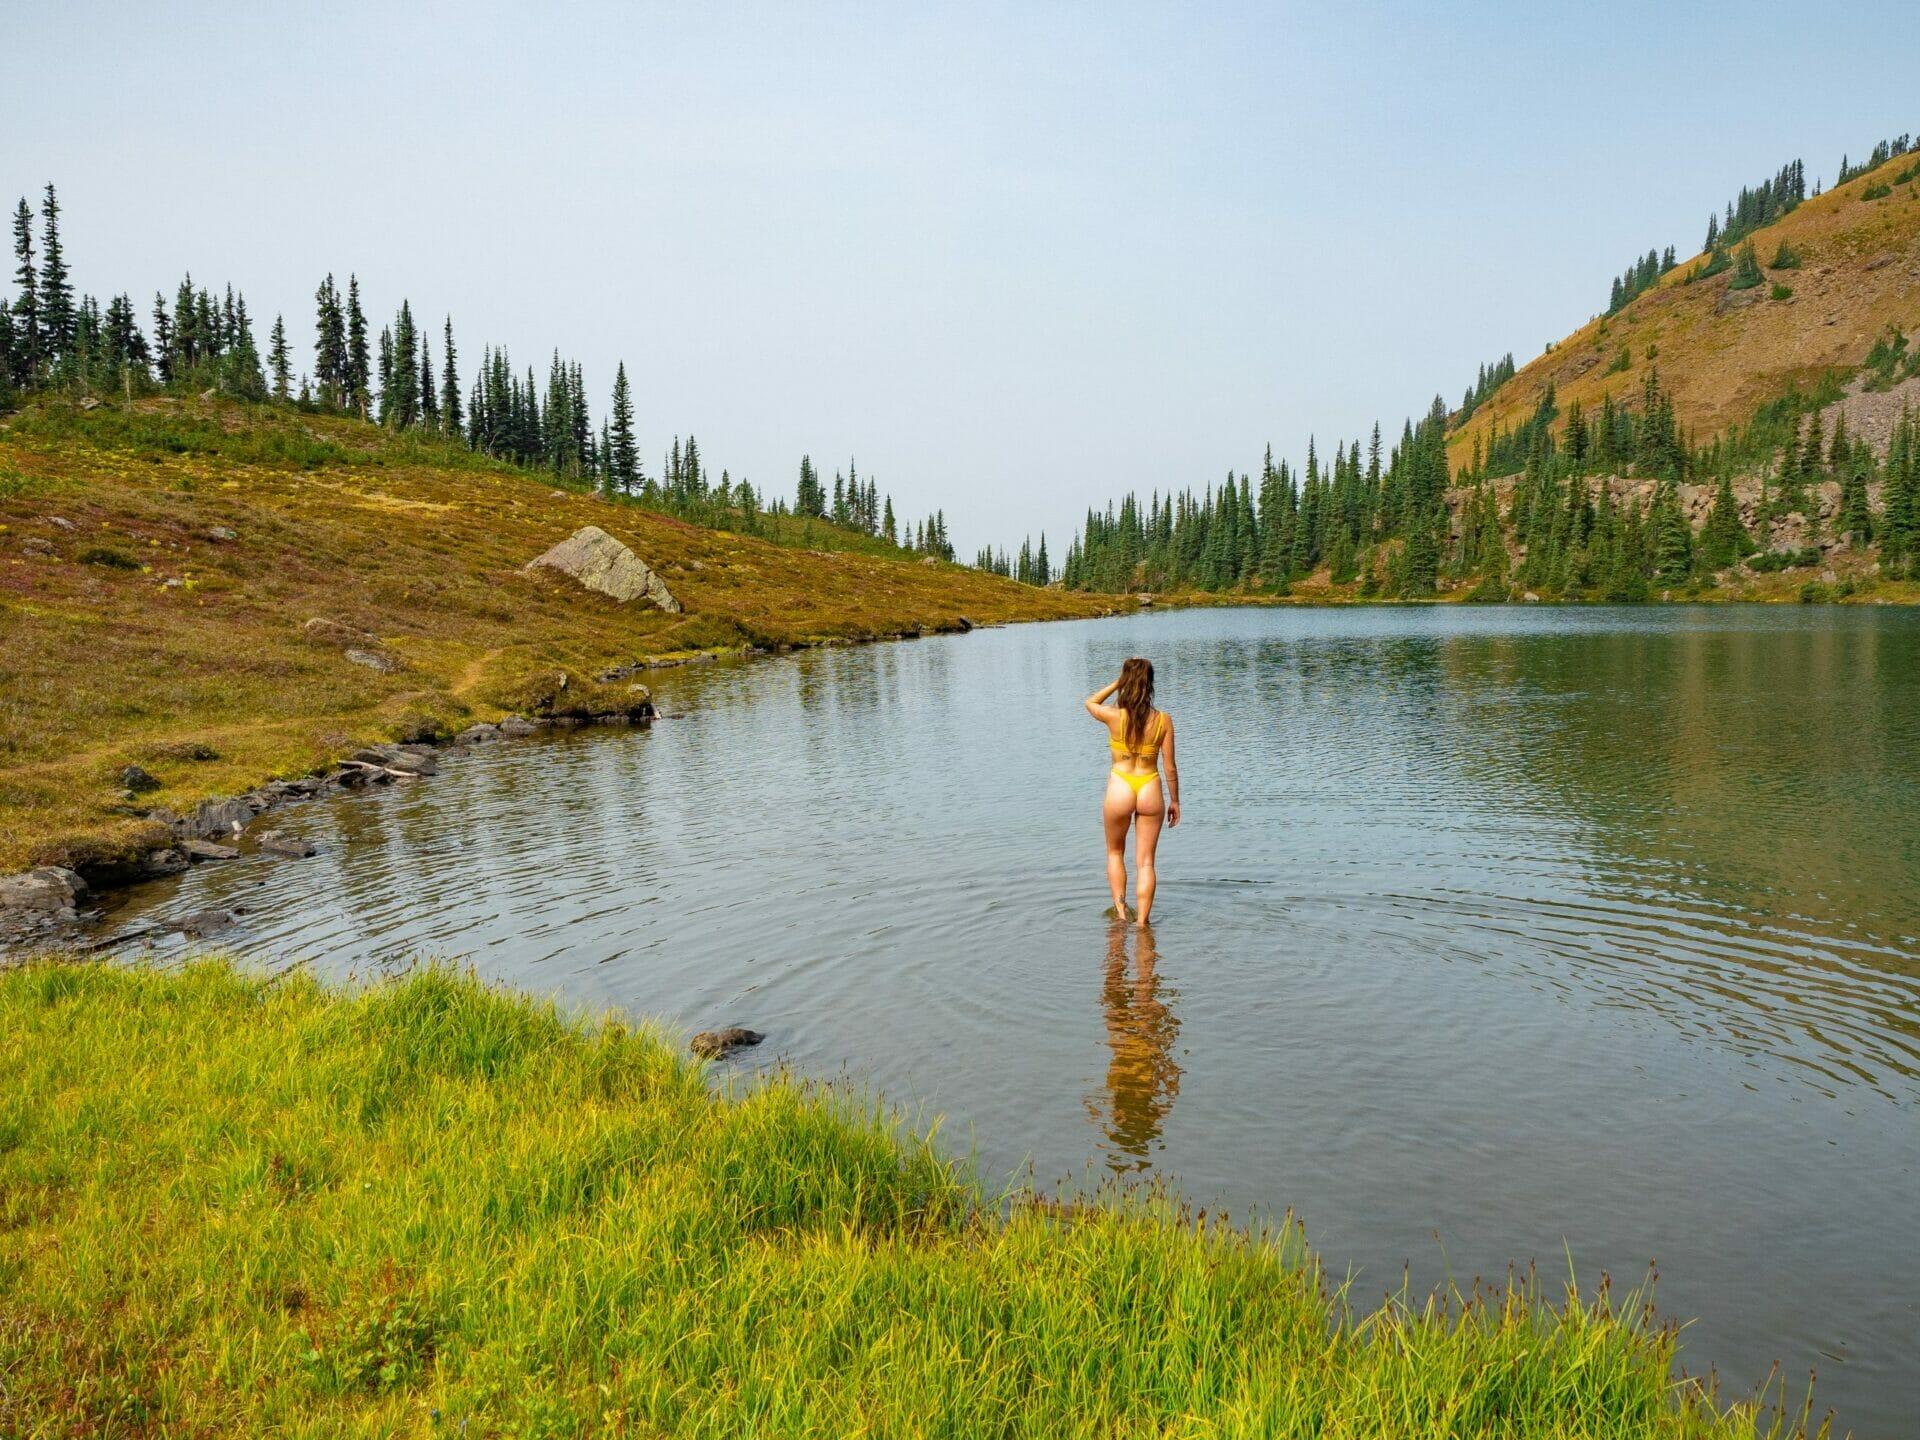 girl swimming lake bikini Alpine Lakes Wilderness